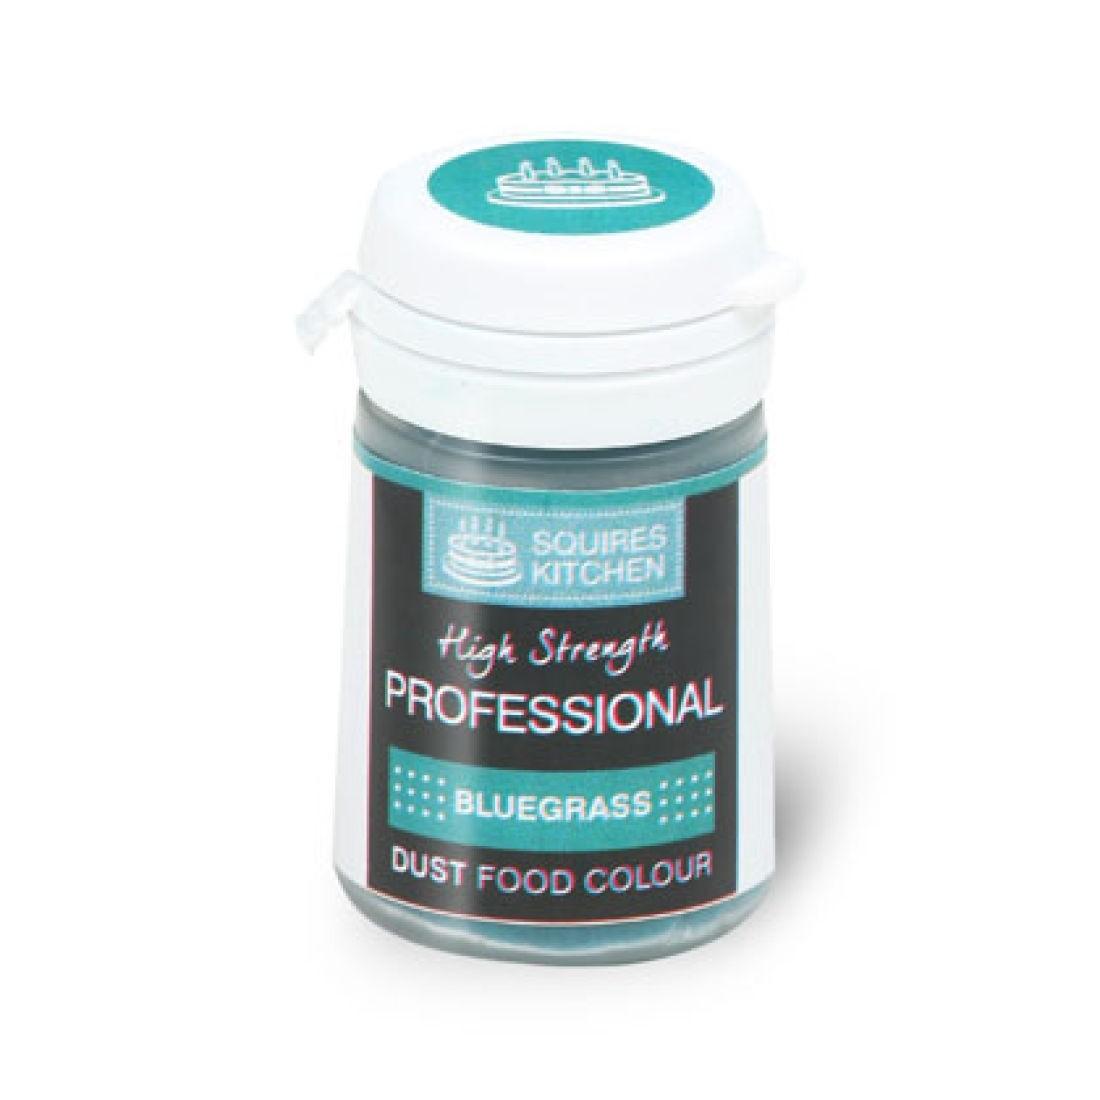 SK Professional Dust Food Colour BlueGrass